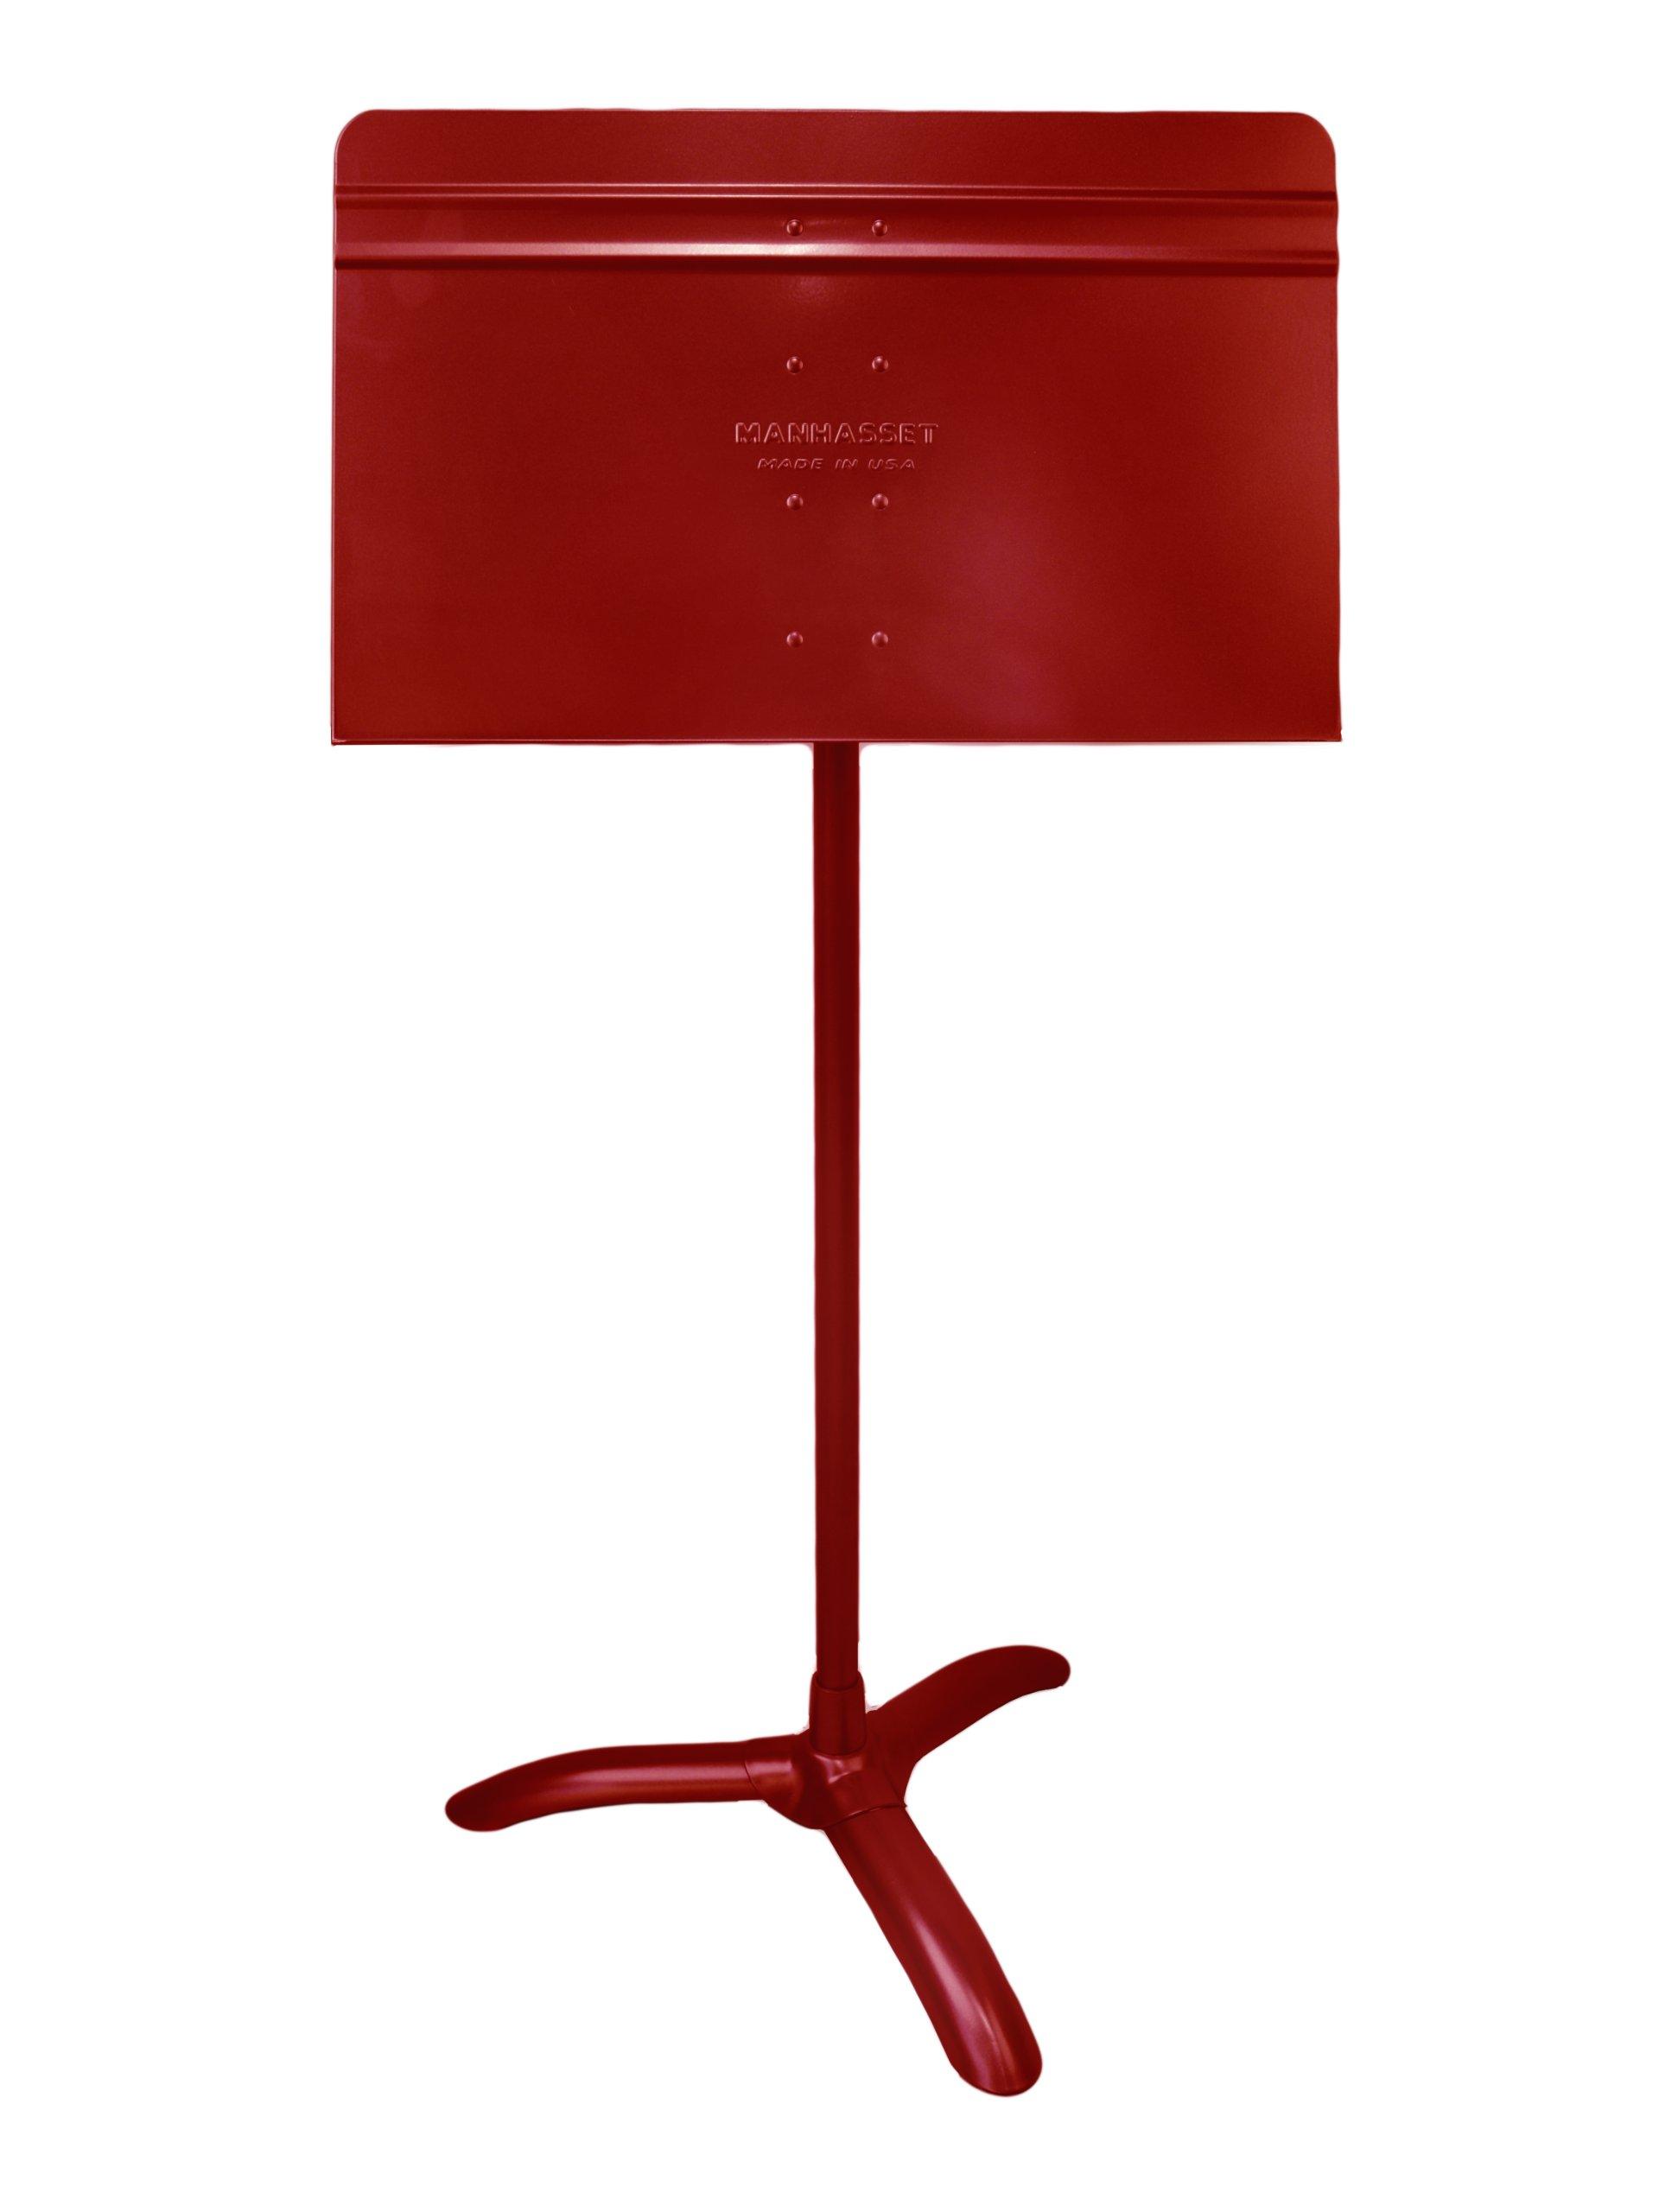 Manhasset 4806BUR Model #48 Symphony Music Stand - Burgundy